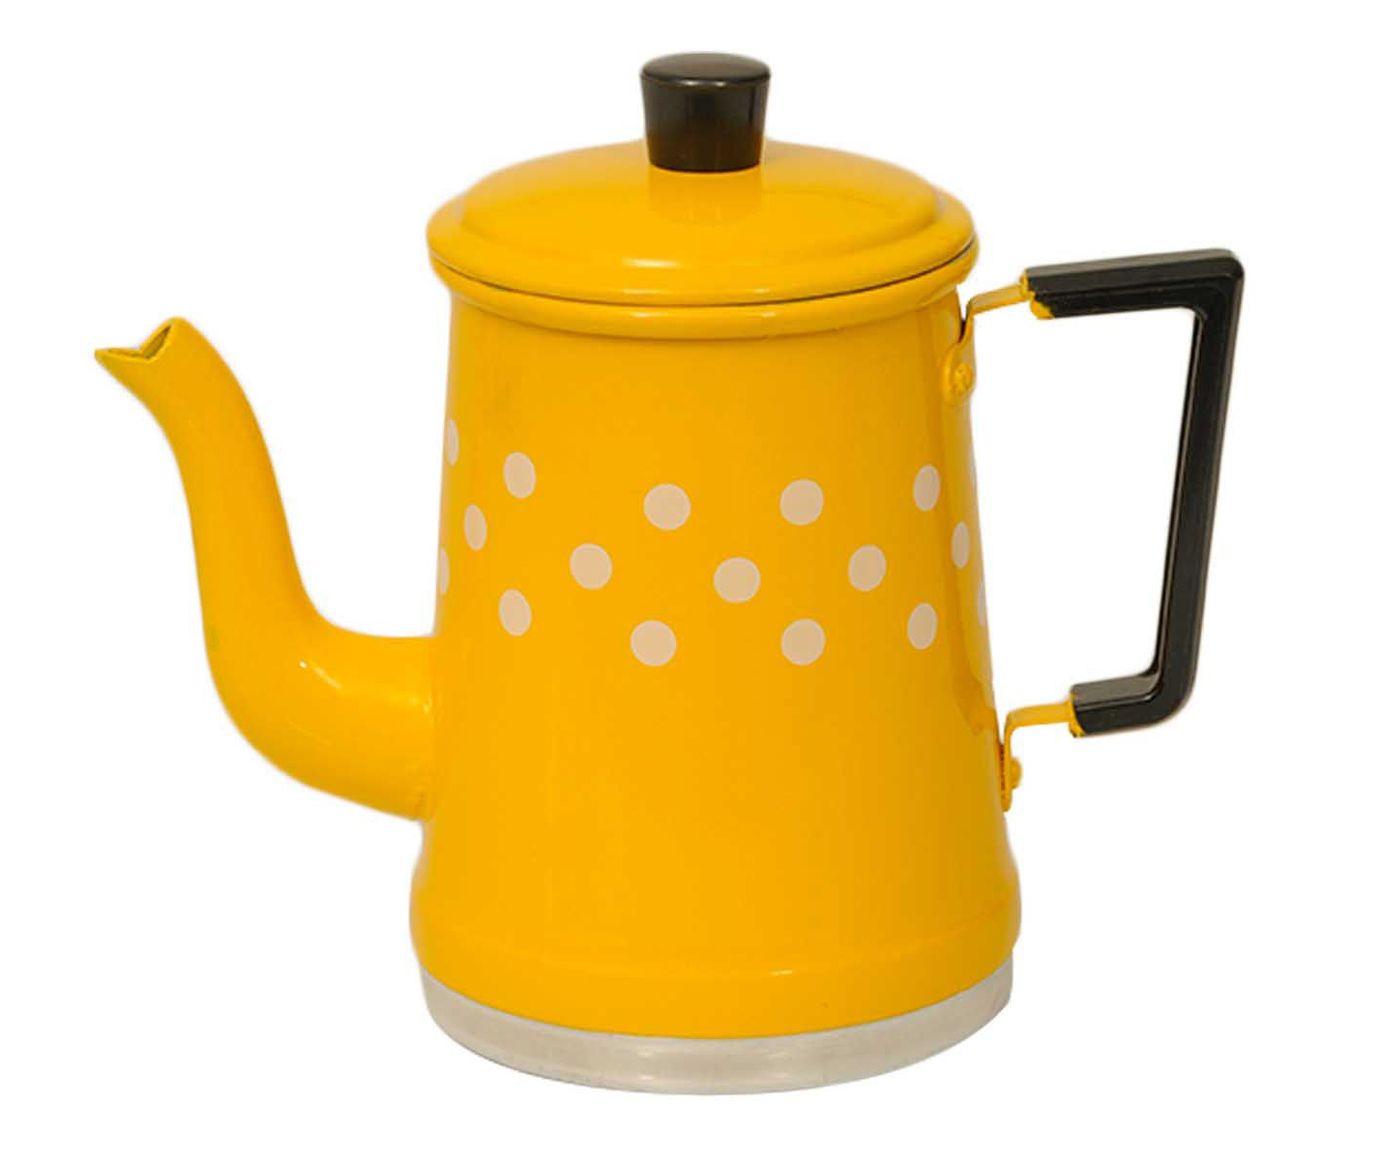 Bule Polka Dots Amarelo e Branco - 1L | Westwing.com.br